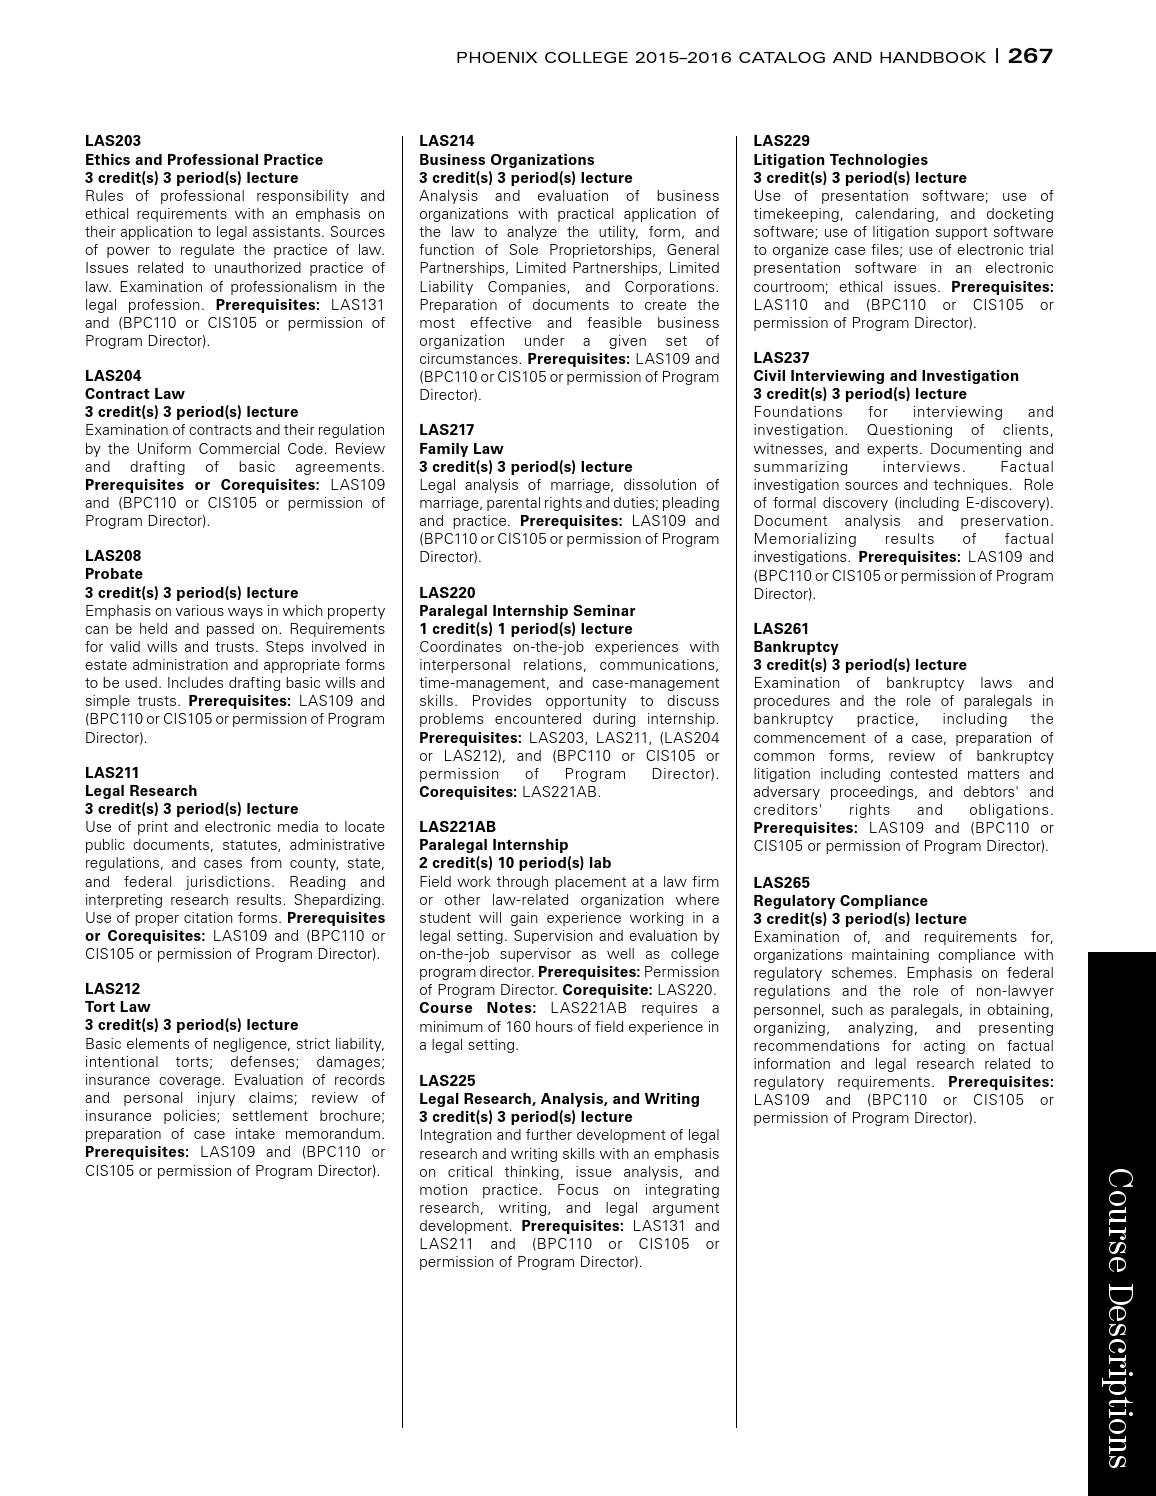 2015-16 Phoenix College Catalog & Handbook by Phoenix College - issuu